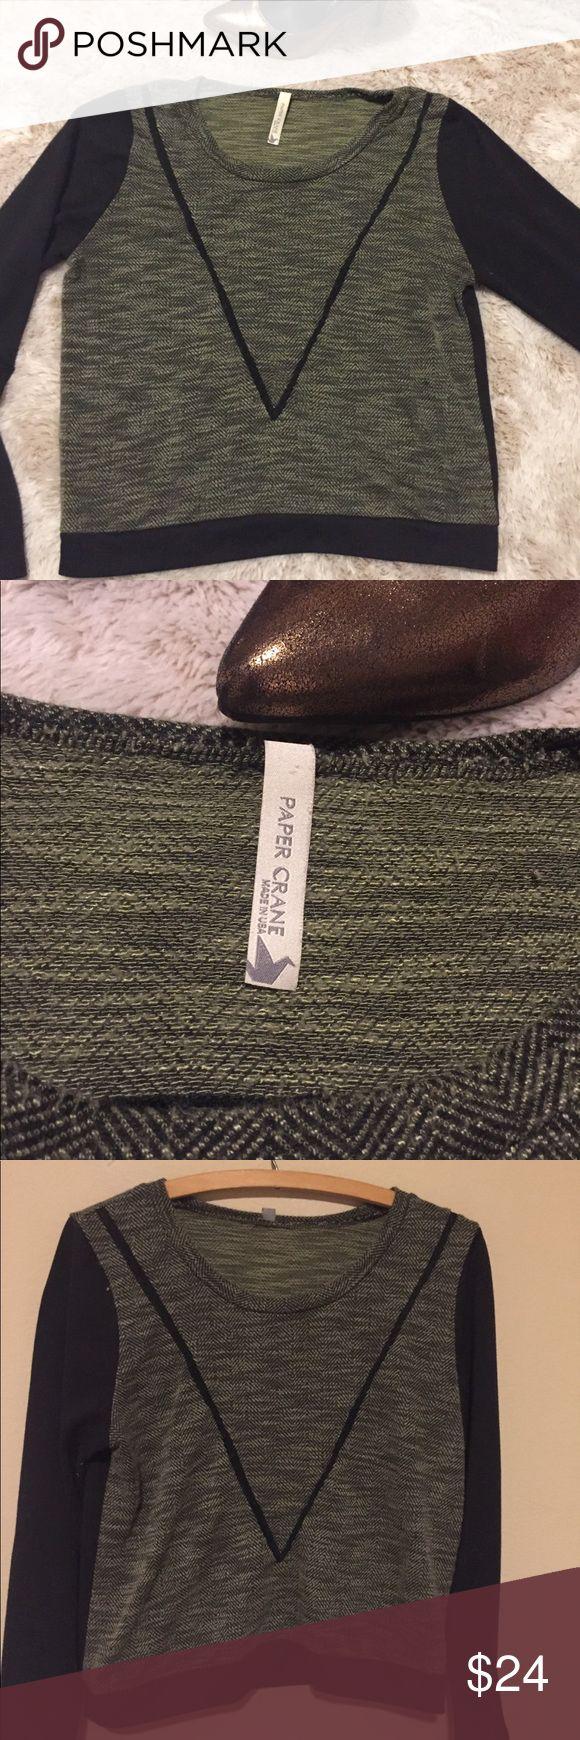 Women's Anthropologie Green Long Sleeve Top Size M Super cute green and black long sleeve top, Anthropologies Paper Crane Brand, Women's Size M Anthropologie Tops Tees - Long Sleeve